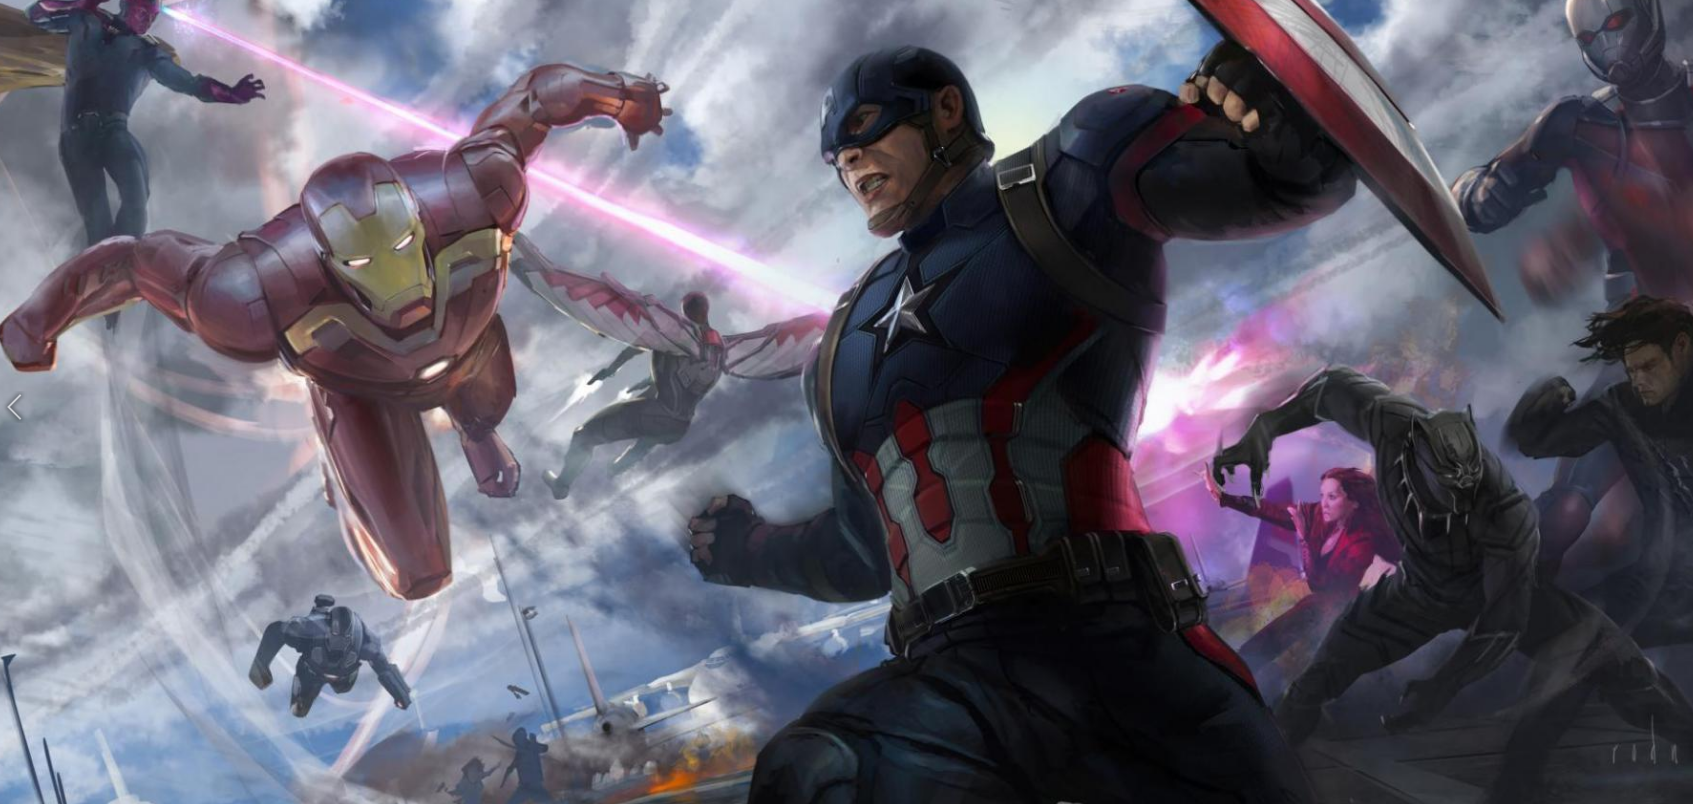 RODNEY FUENTEBELLA Splash panel/ Keyframe for Captain America: Civil War 2016 © 2017 MARVEL